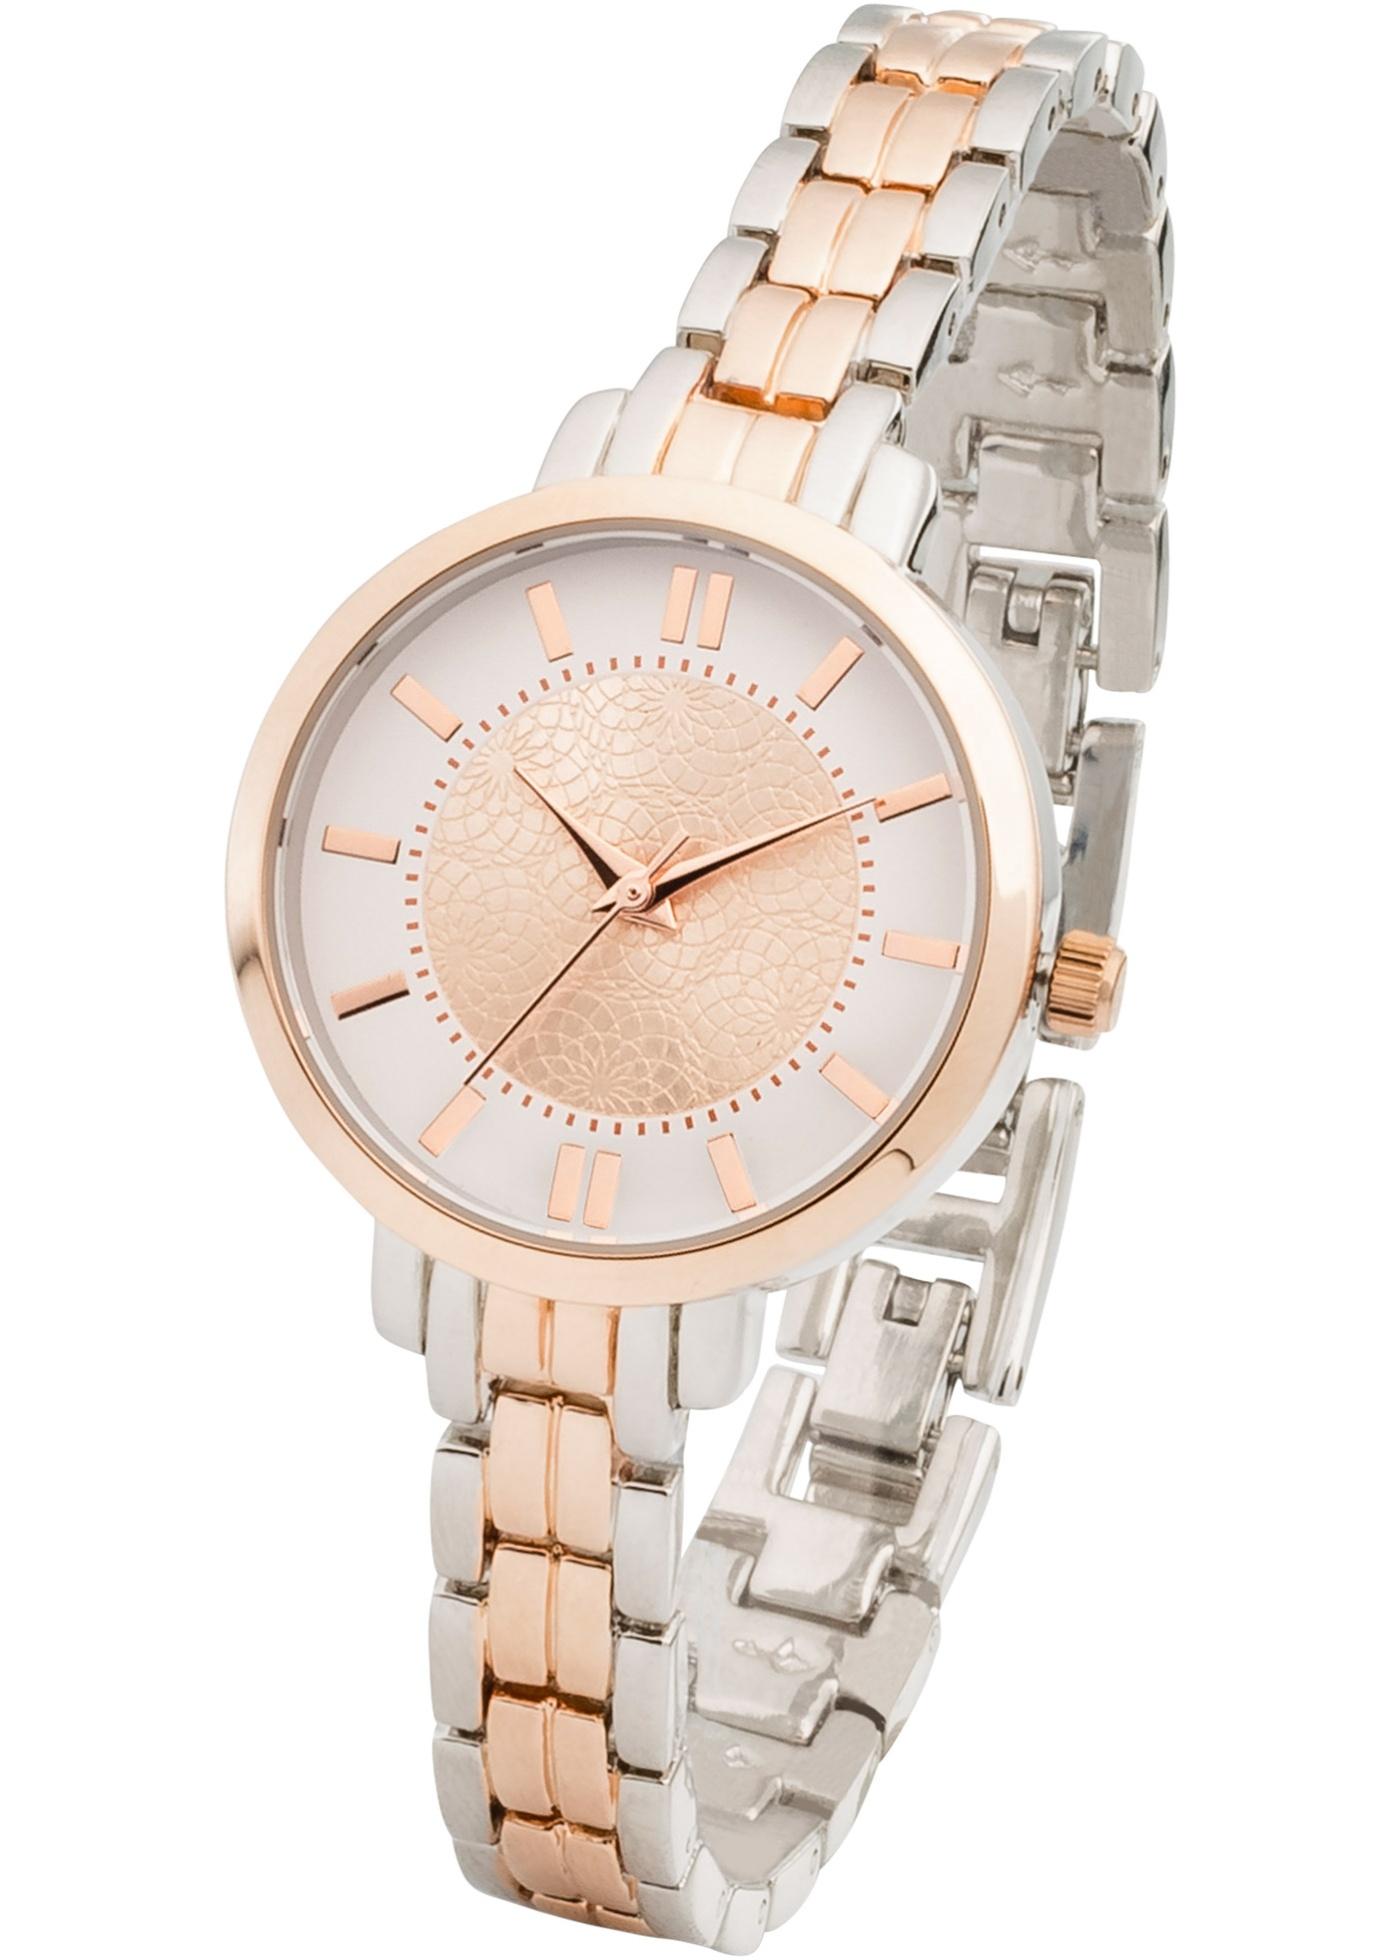 b33dbdea090 Náramkové hodinky Bicolor - zlatá